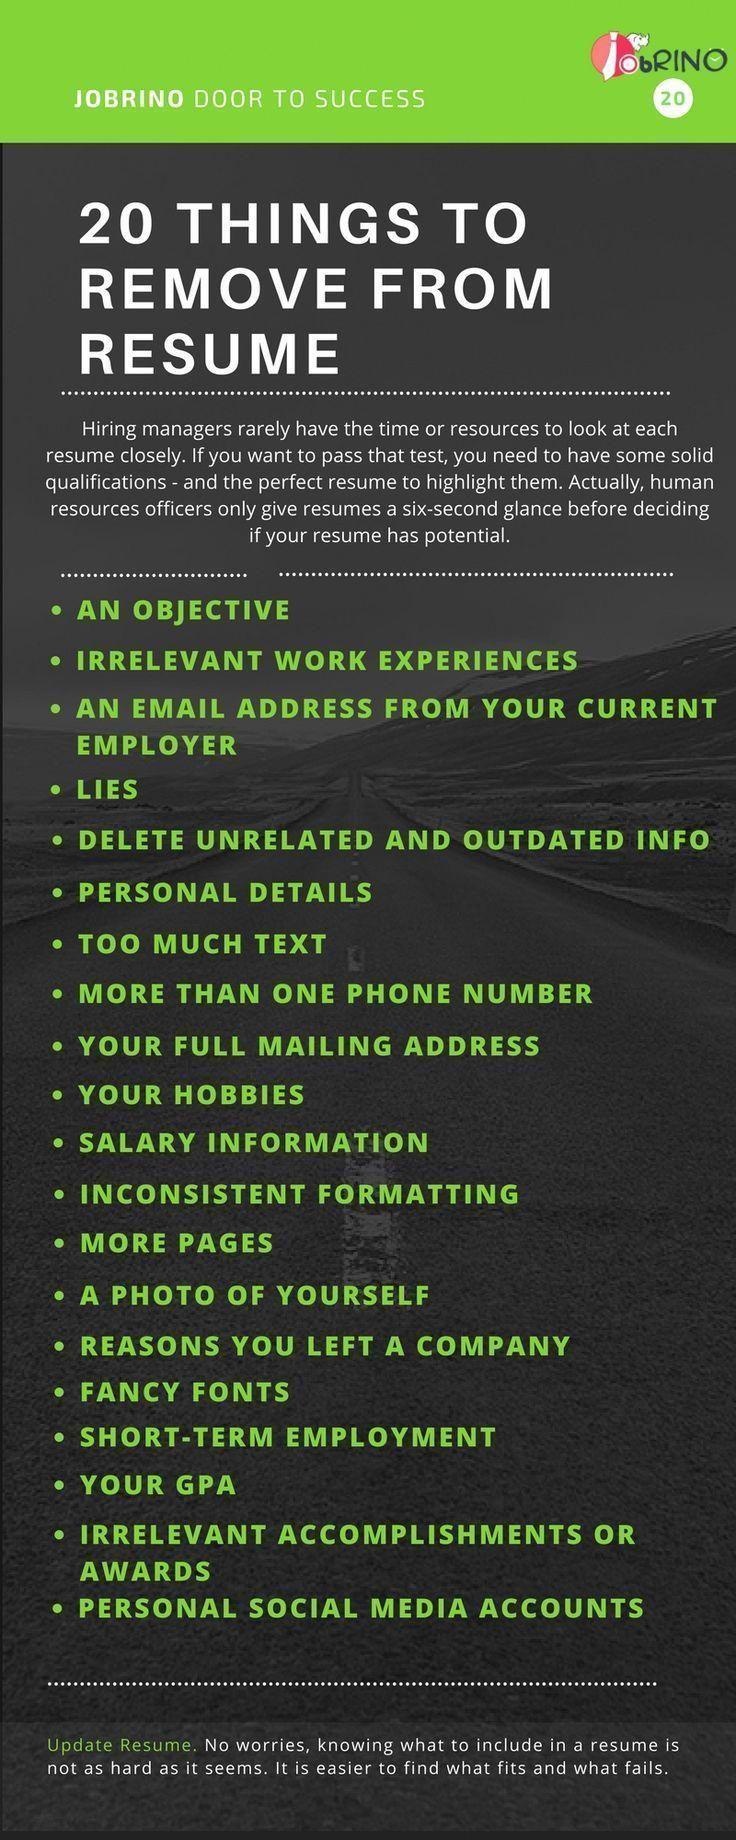 e9322a3b8f65a92305492c3488bef6d4 - How To Pass The Best Buy Application Test